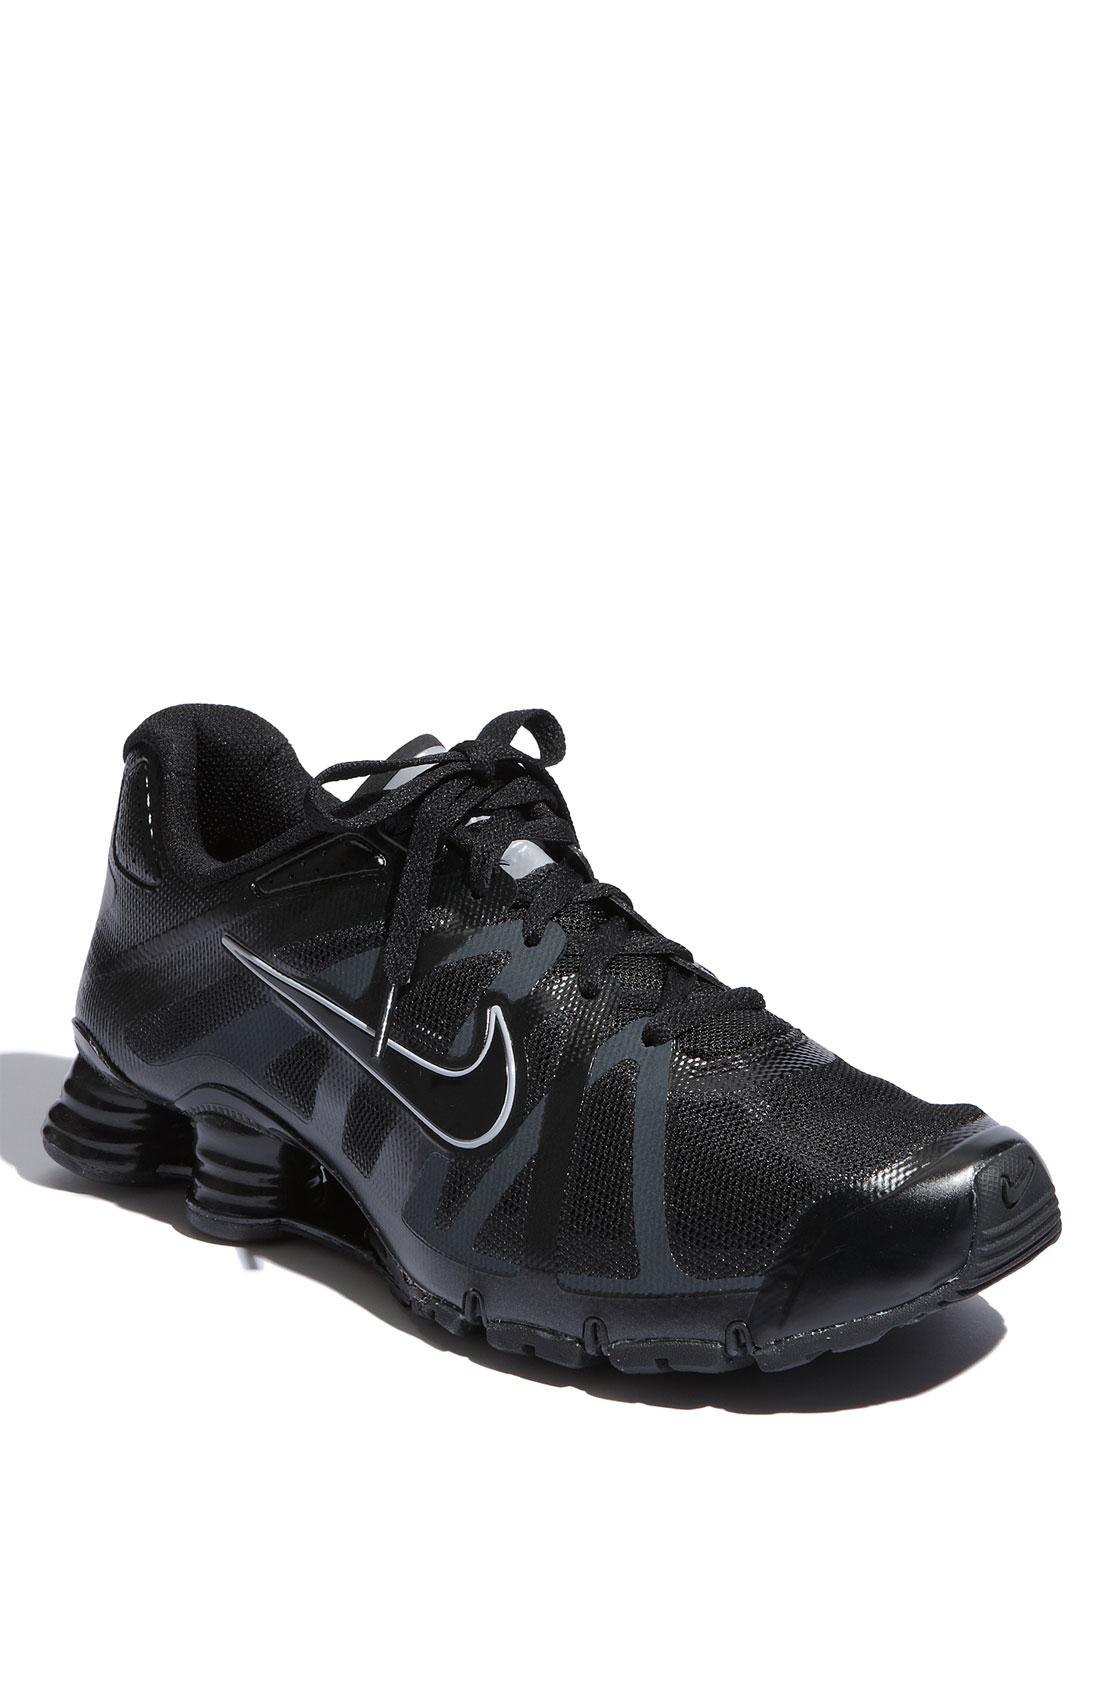 super popular afe3f 3e772 ... Nike Shox Roadster Trail Running Shoe in Black for Men Lyst ...